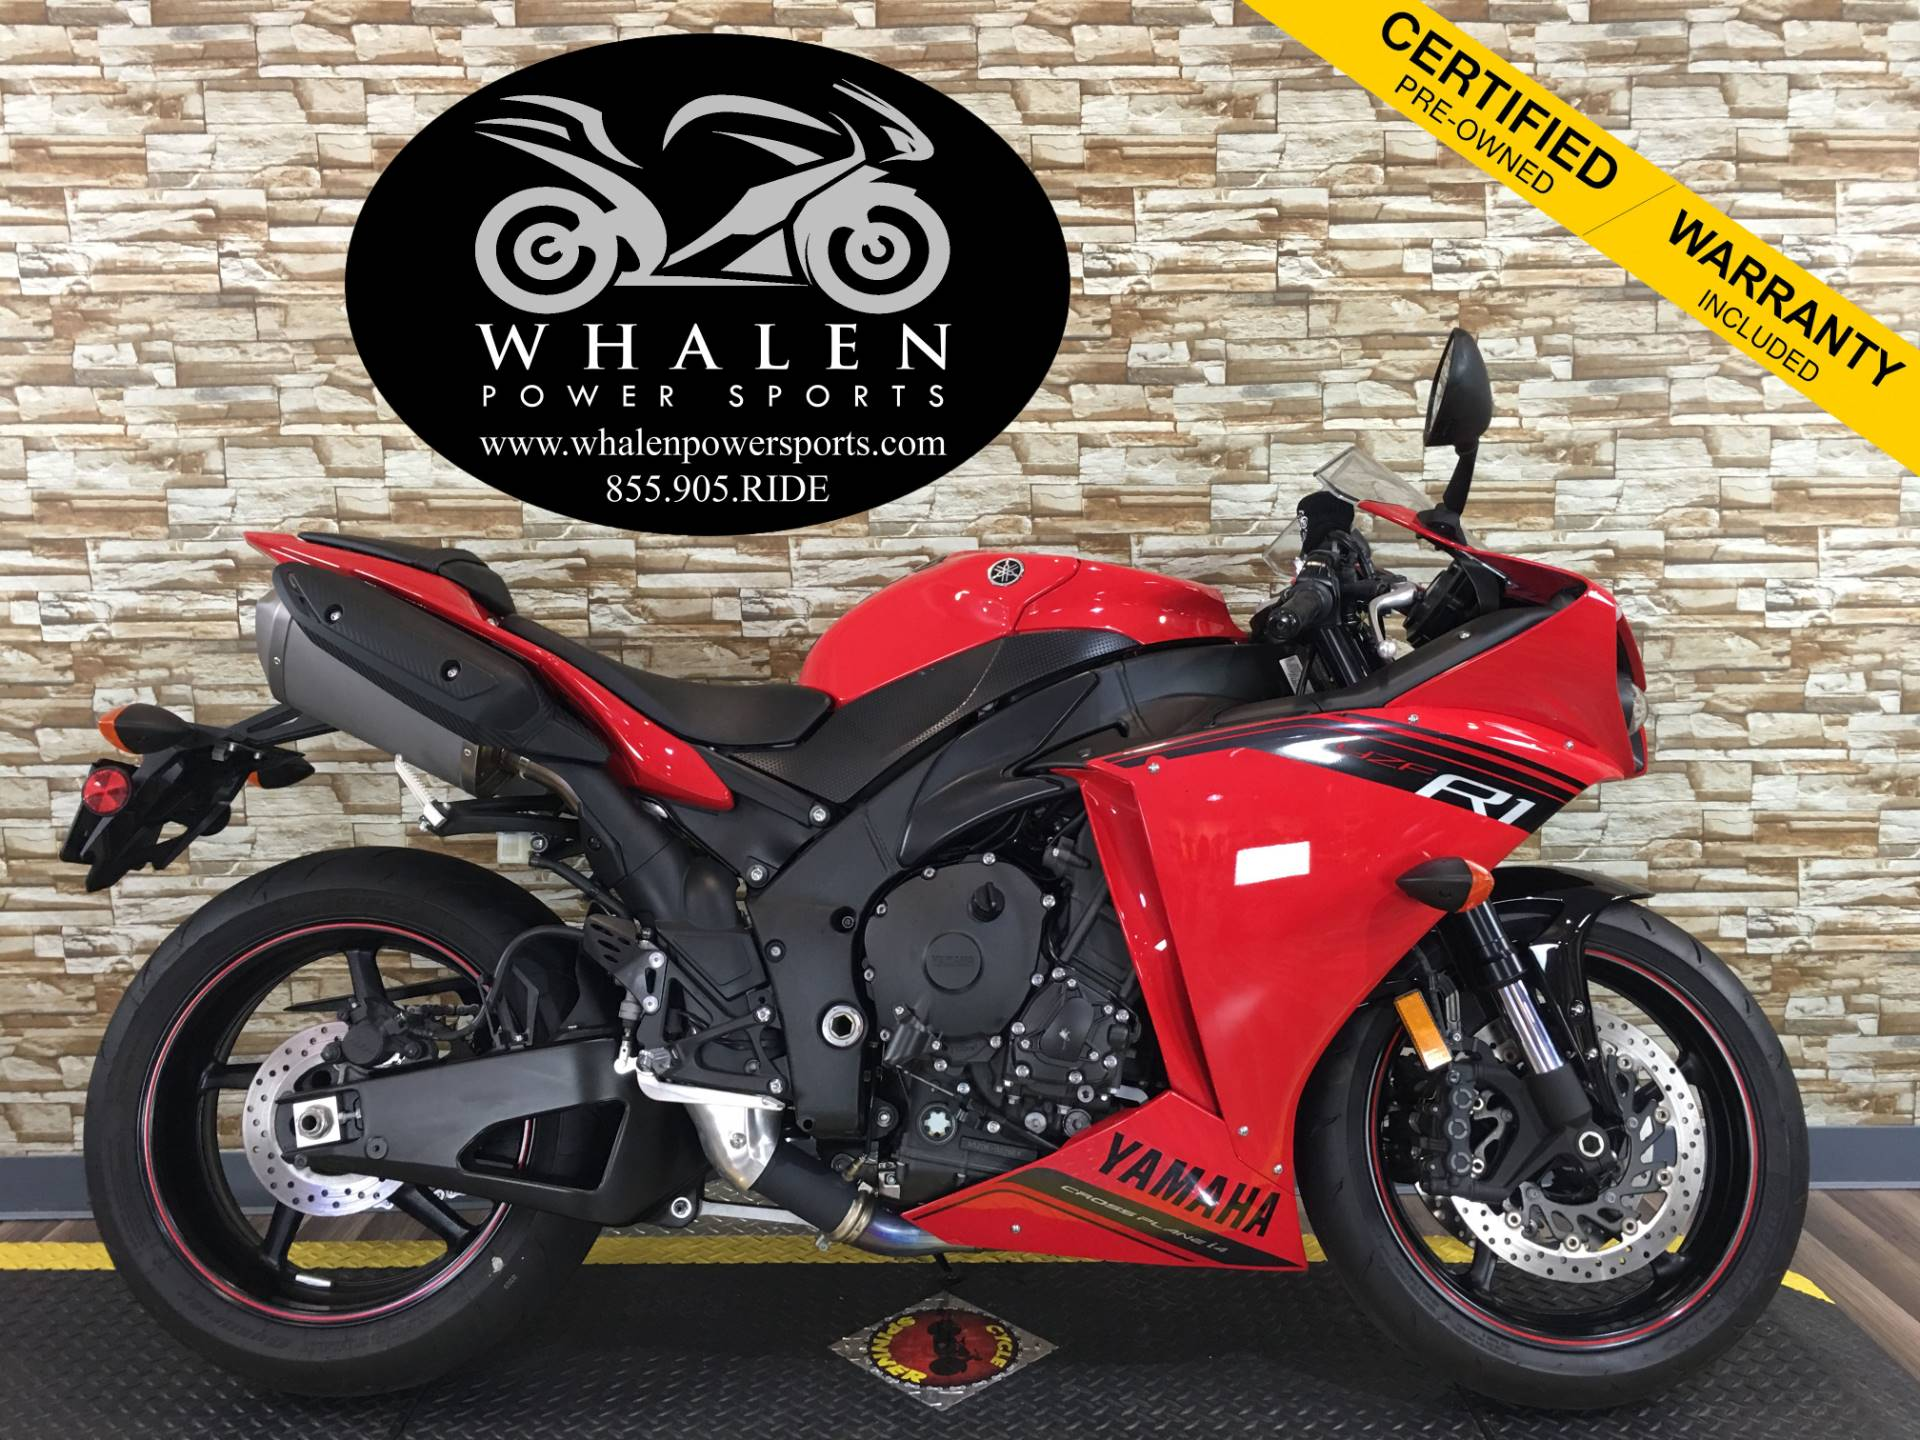 2014 Yamaha YZF-R1 for sale 75624